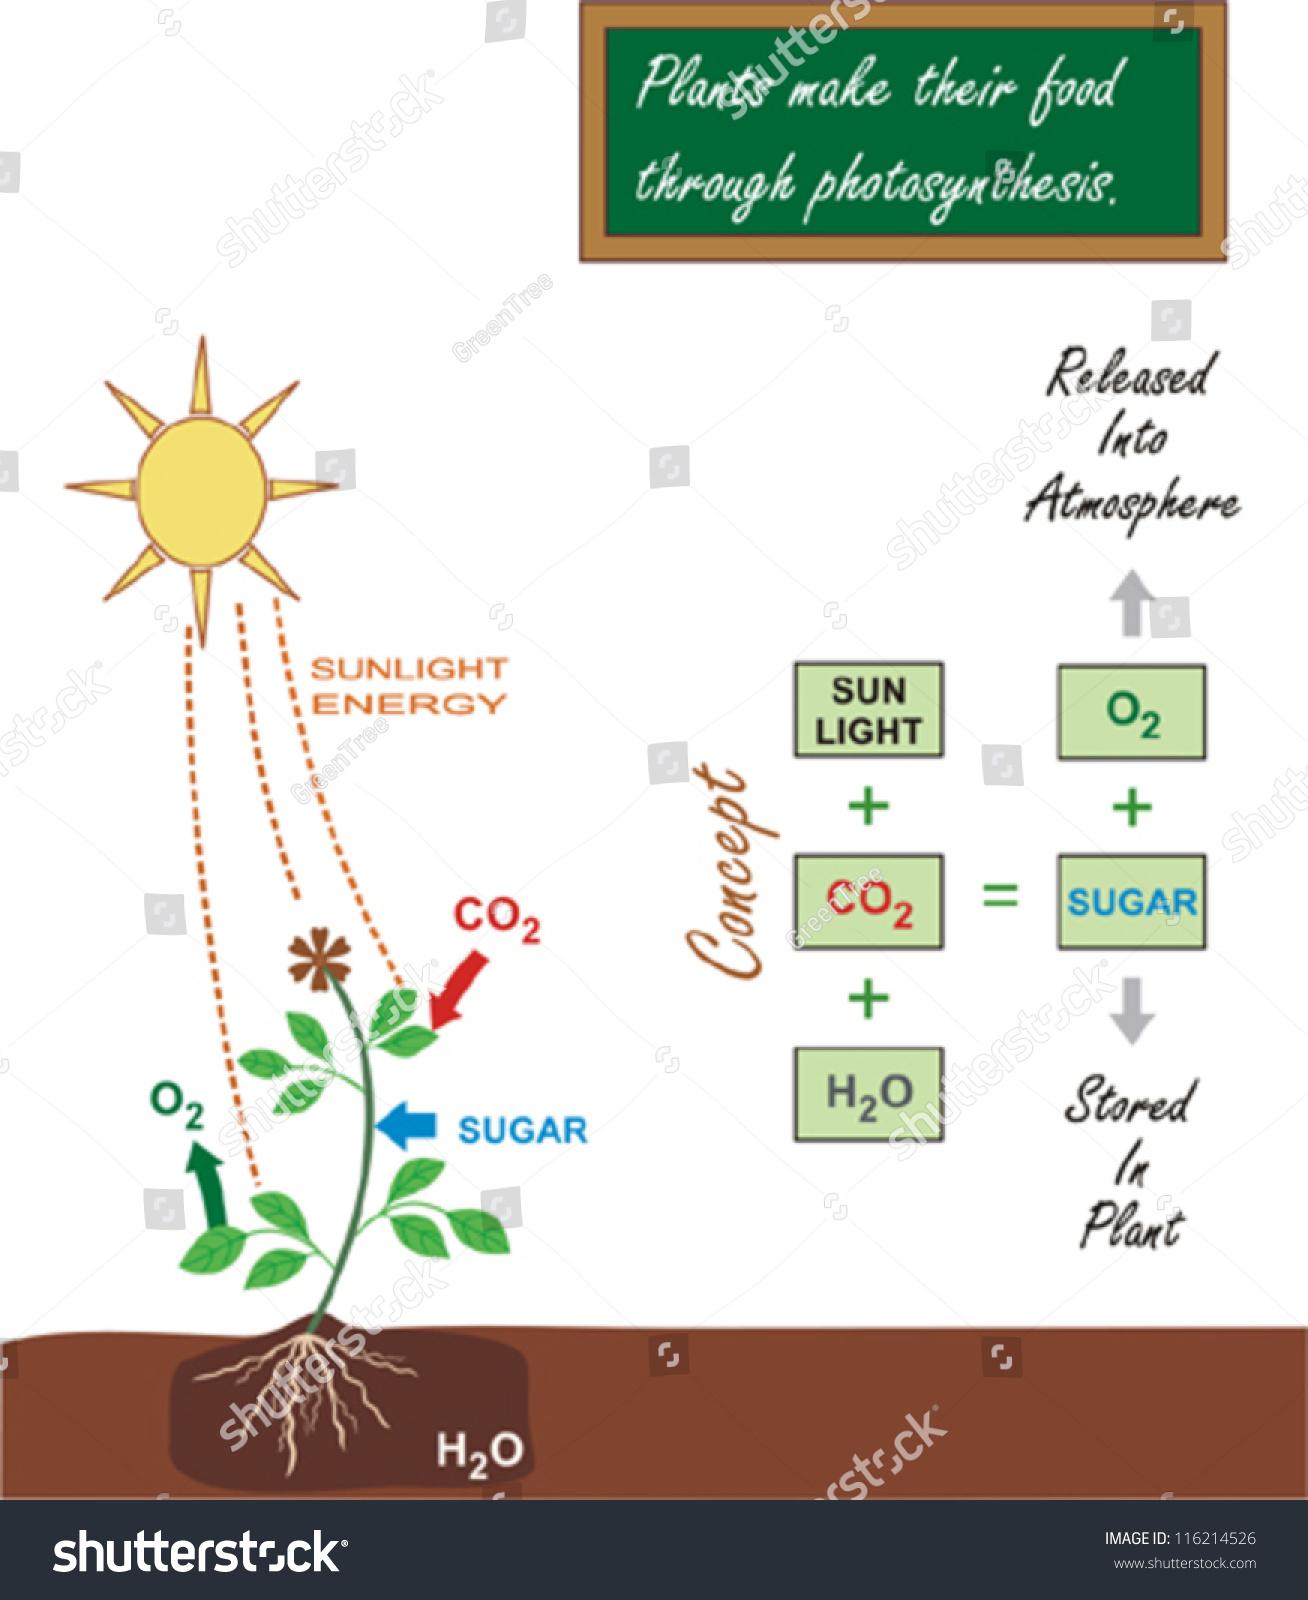 photsynthesis process